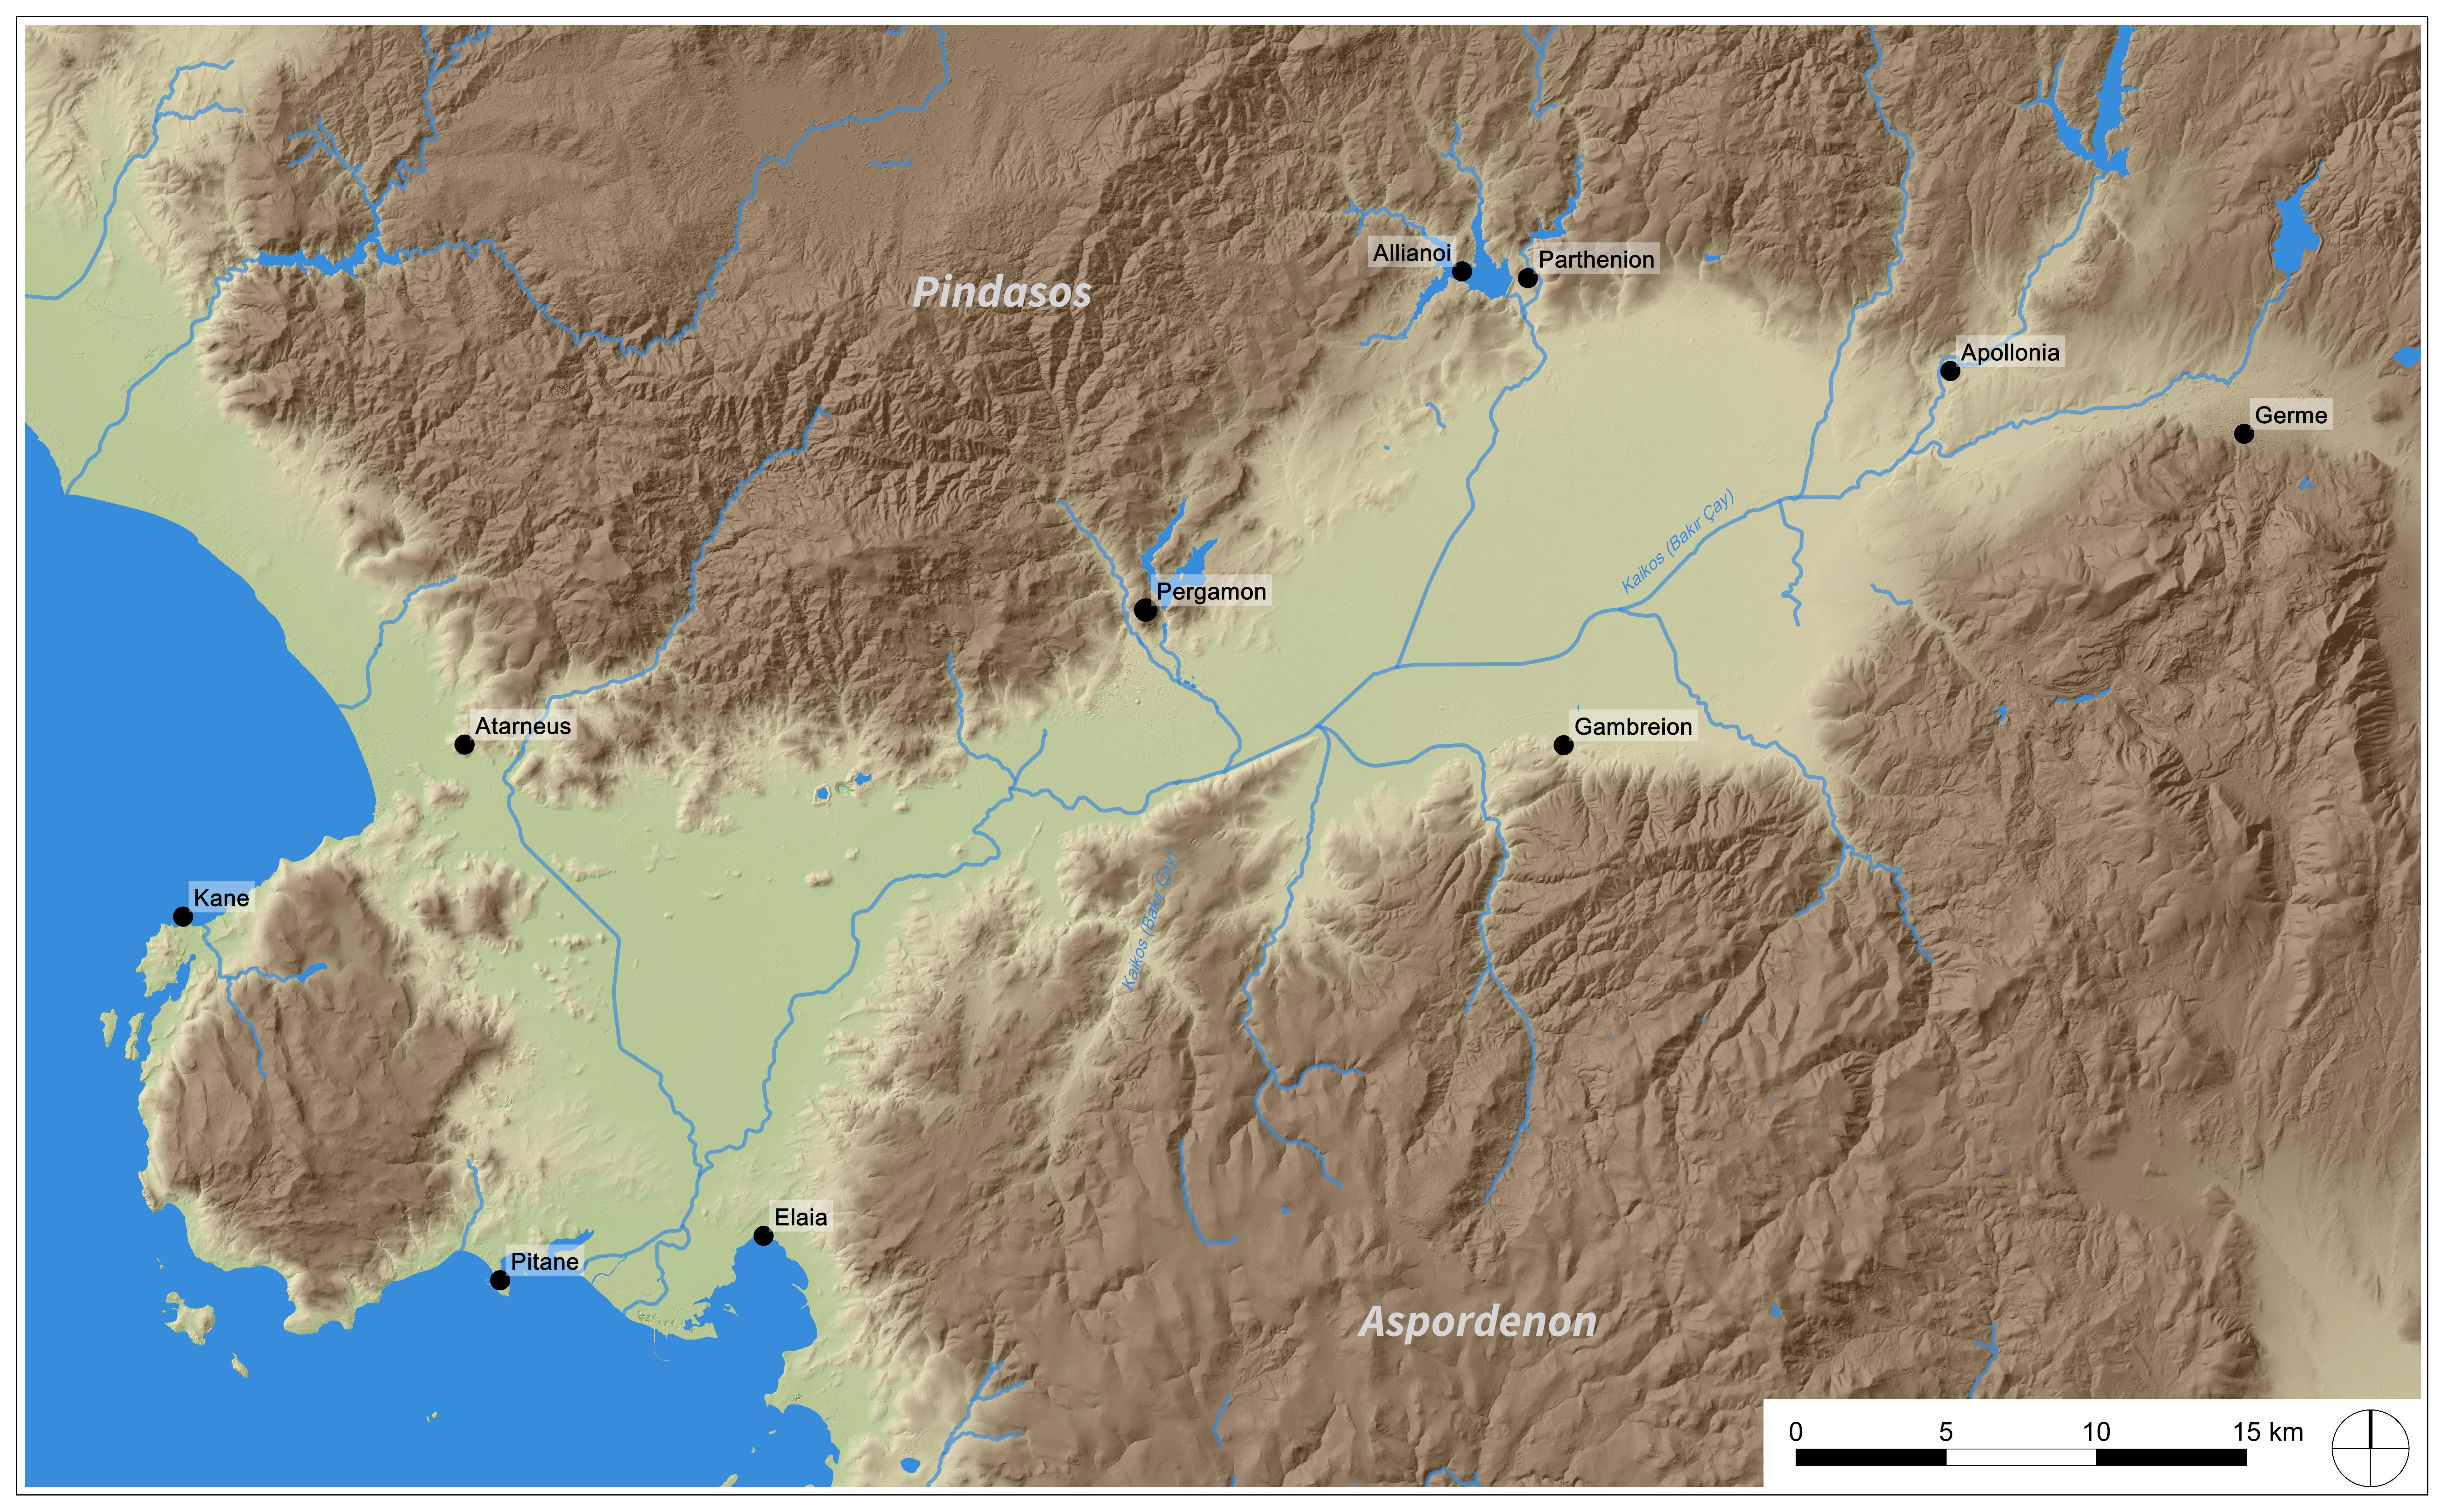 Pergamon mikro bölgesi (B. Ludwig – DAI-Pergamongrabung)